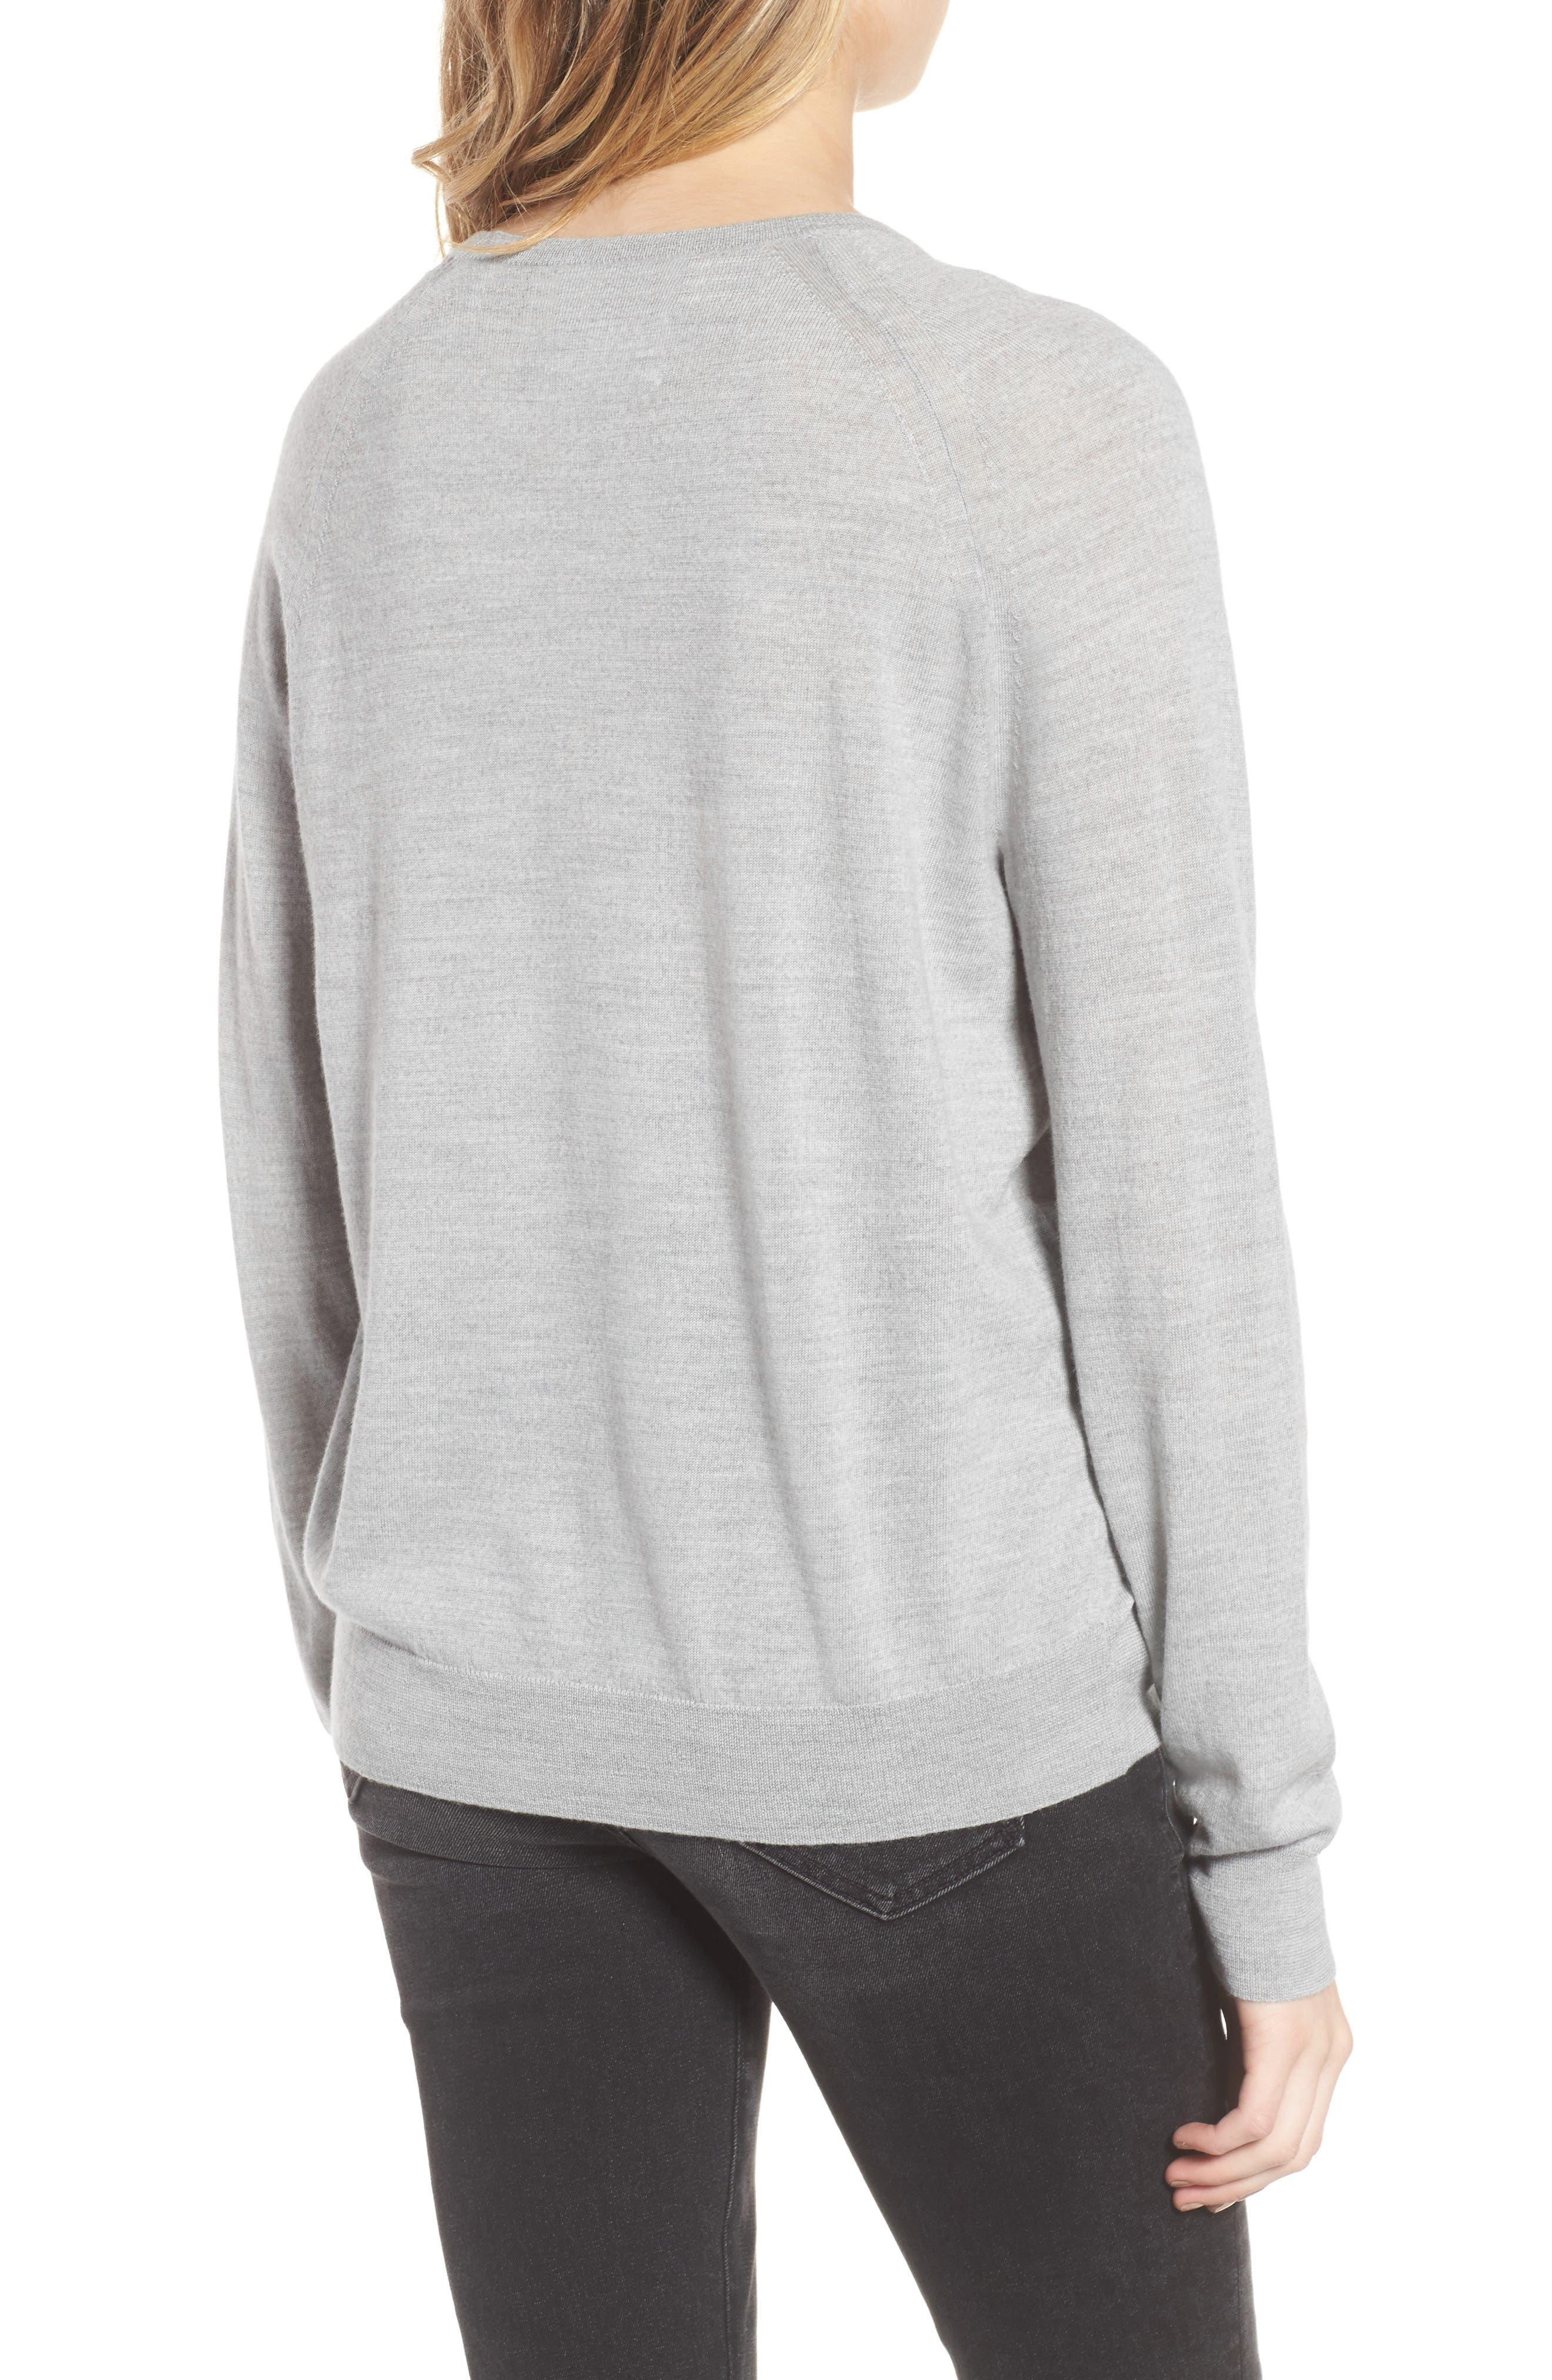 Rime Bis Merino Wool Sweater,                             Alternate thumbnail 2, color,                             078